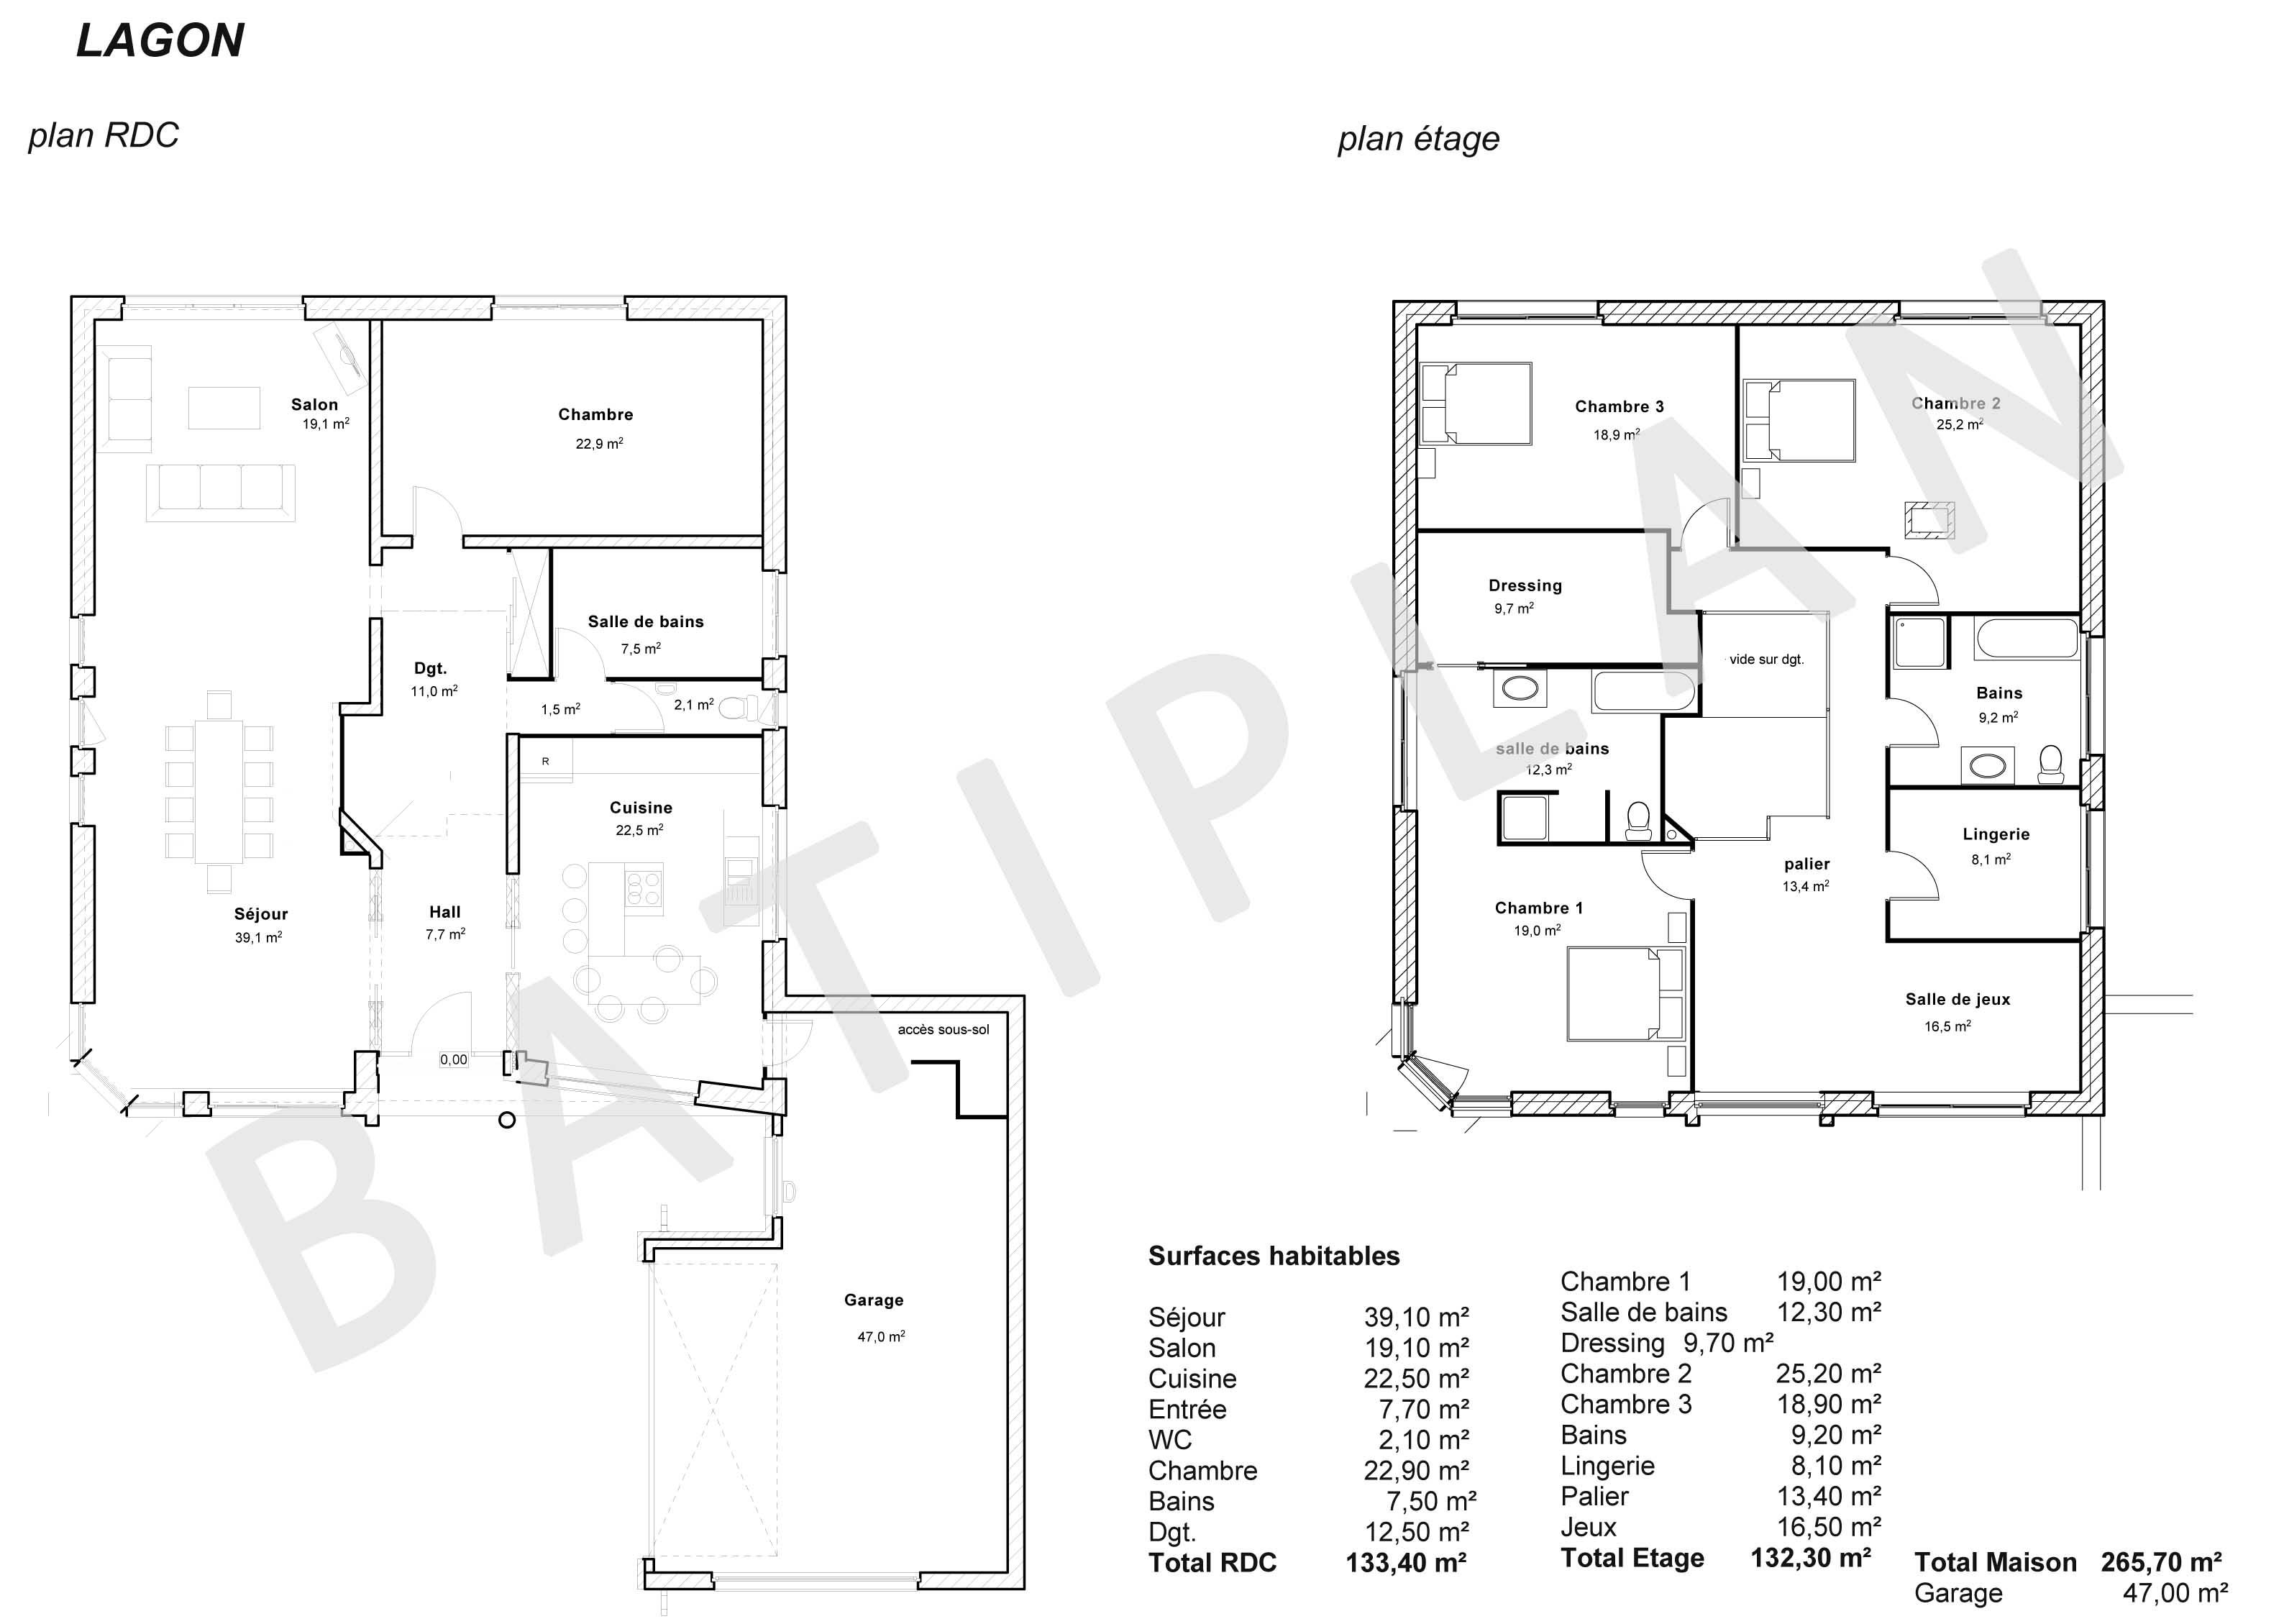 Plan maison lagon with plan pour construire une maison for Pour construire une maison